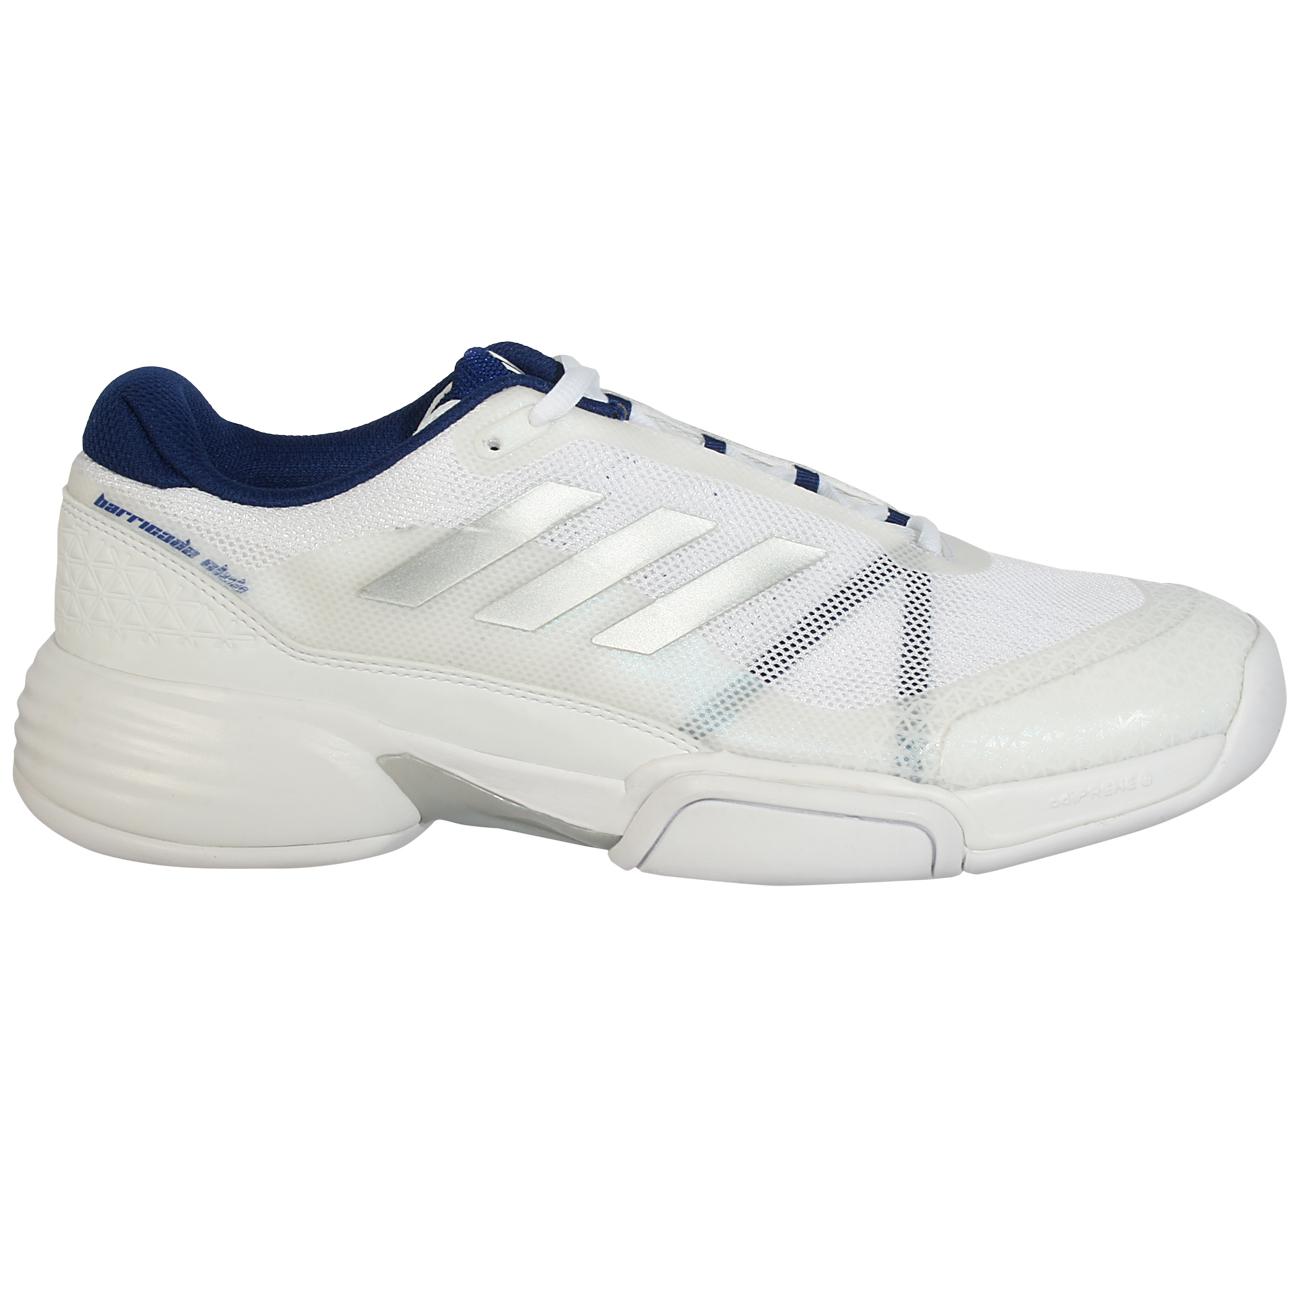 Adidas Herren Tennisschuh barricade club cpt